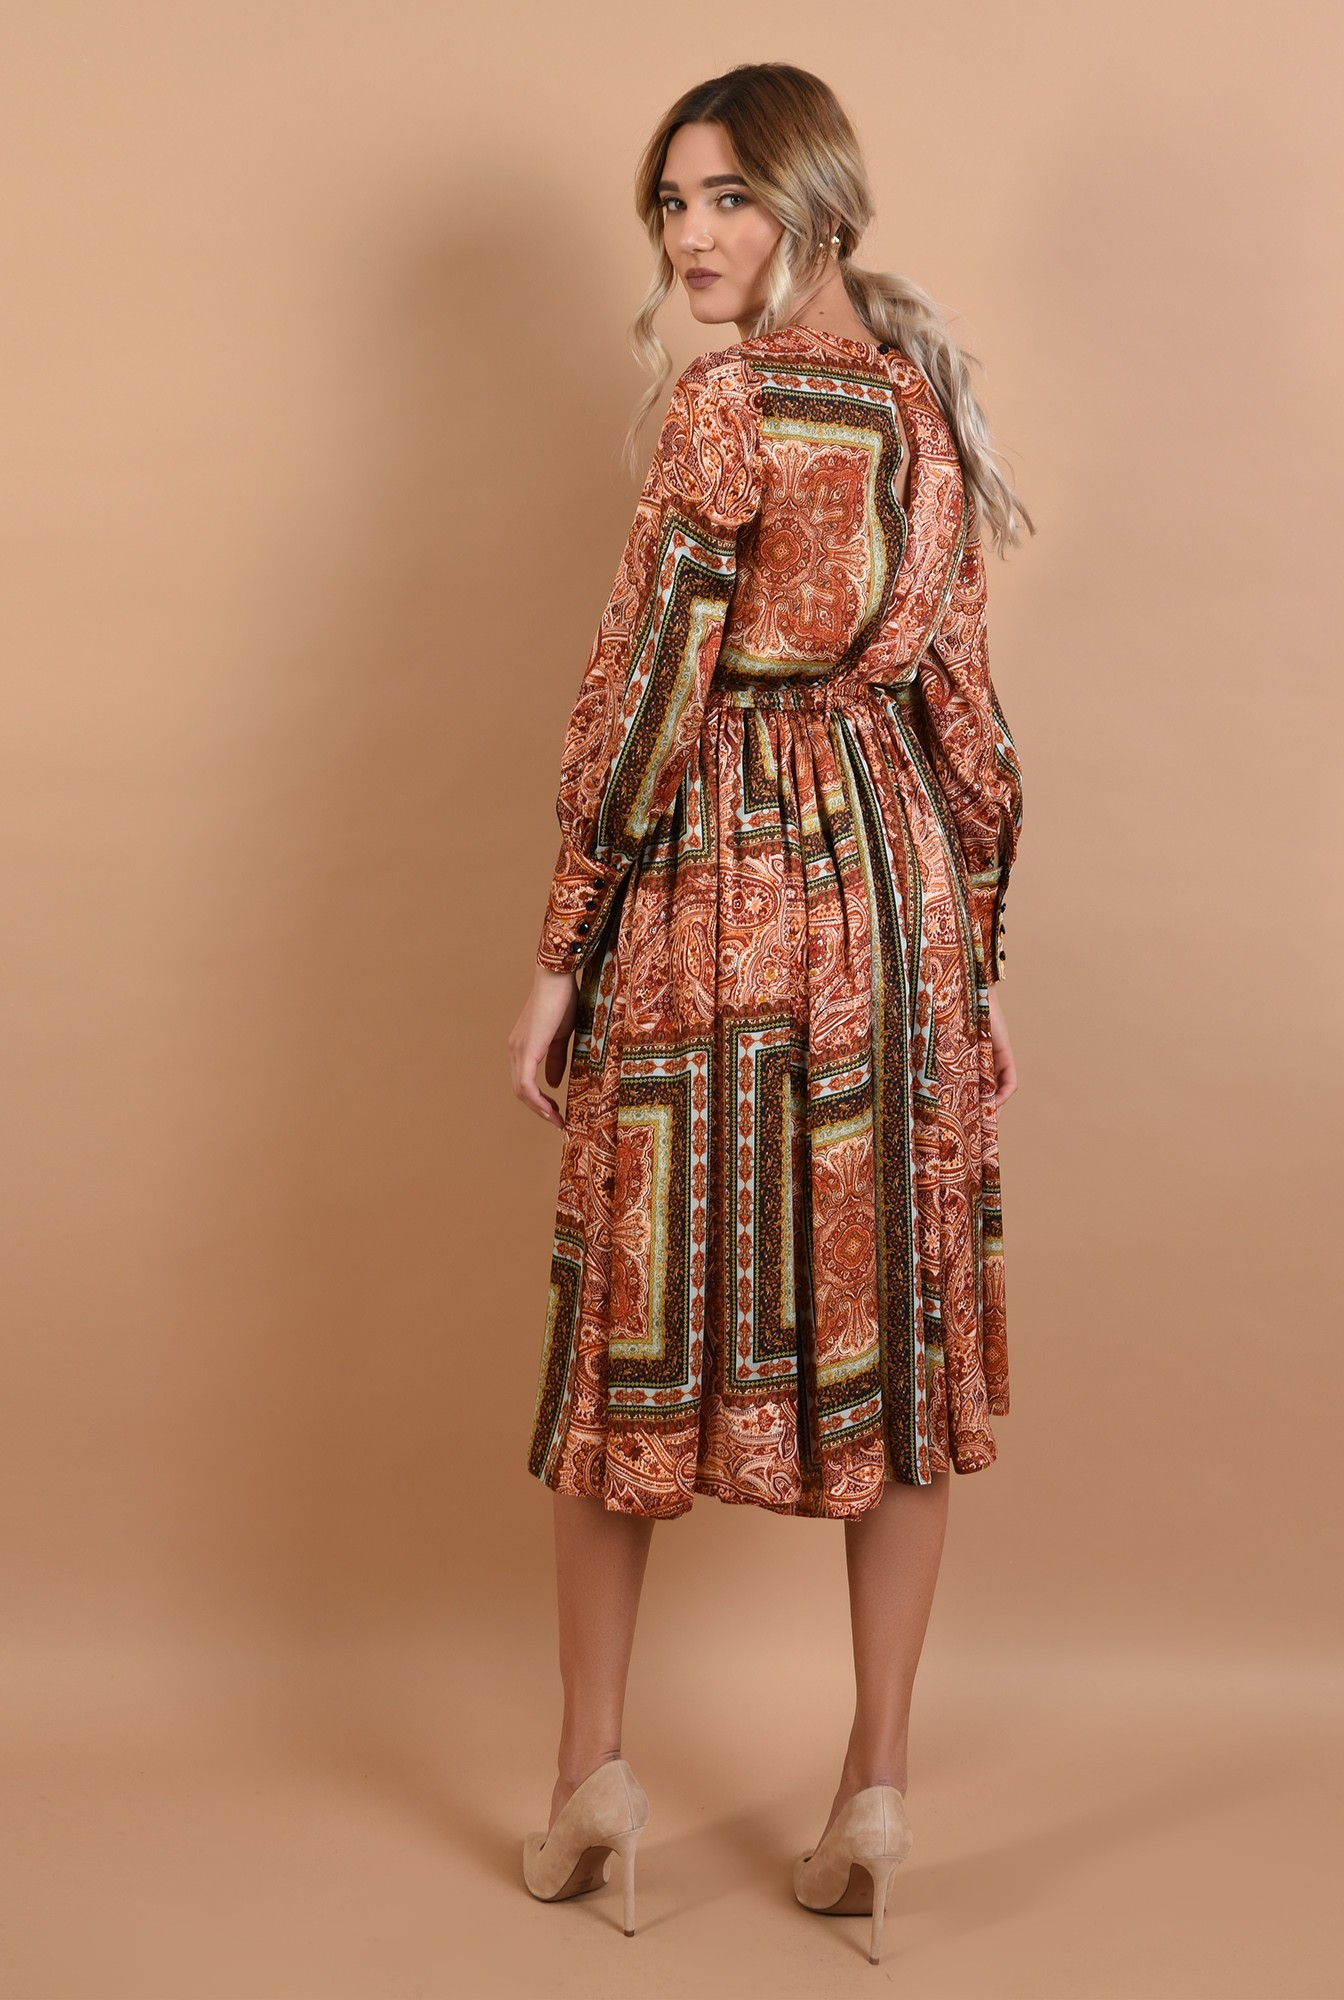 1 - 360 - rochie evazata, midi, satin imprimat, cu cordon, cu mansete